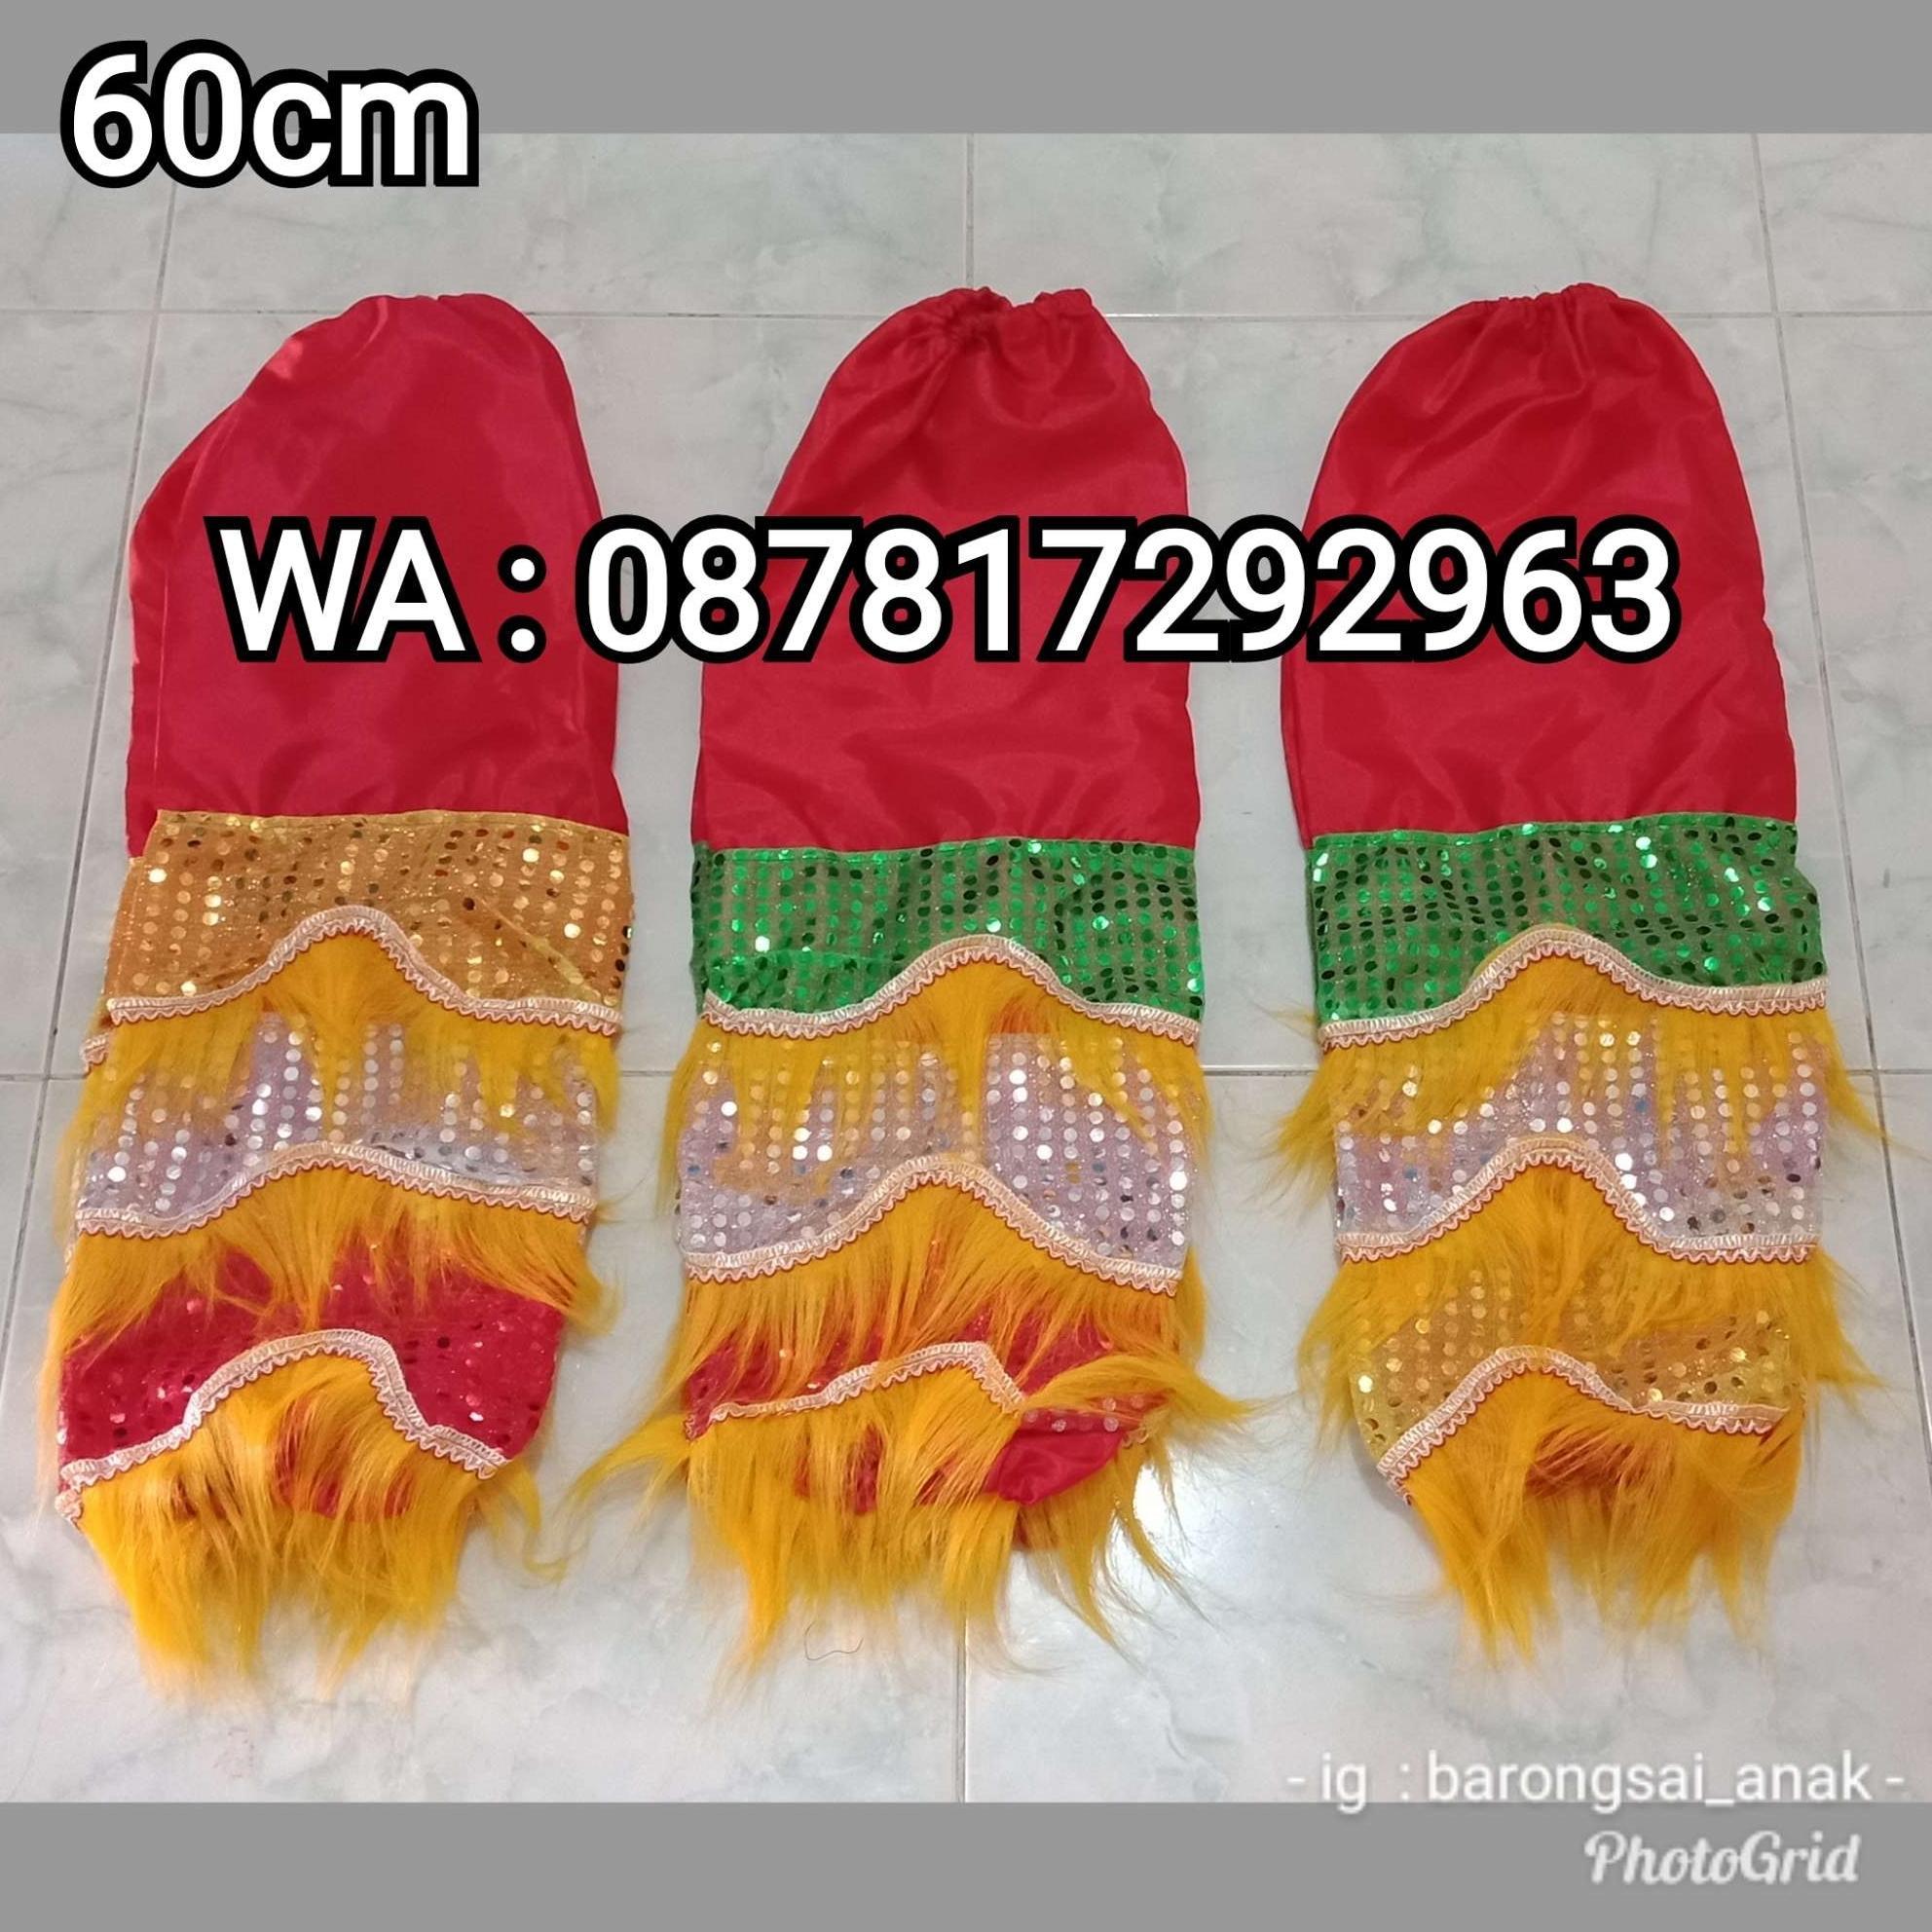 Celana Barongsai Anak bulu warna Kuning panjang 60cm